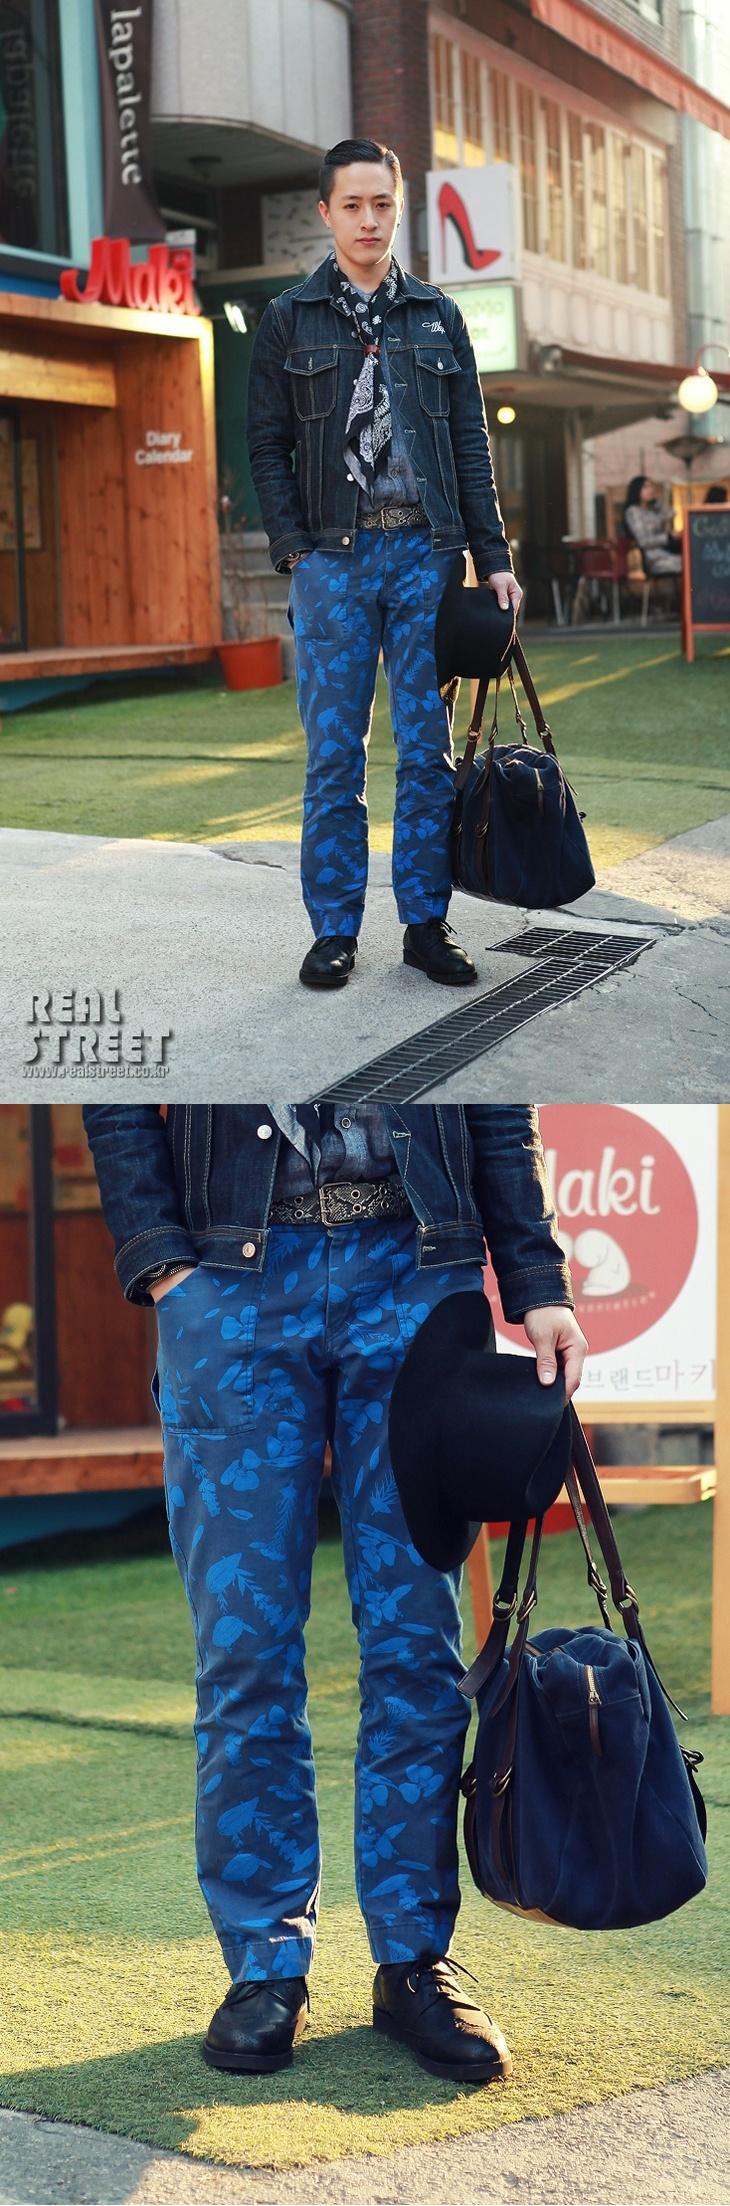 street fashion - GRIENICH HAMPTON COLLECTION WEEKEND NAVY